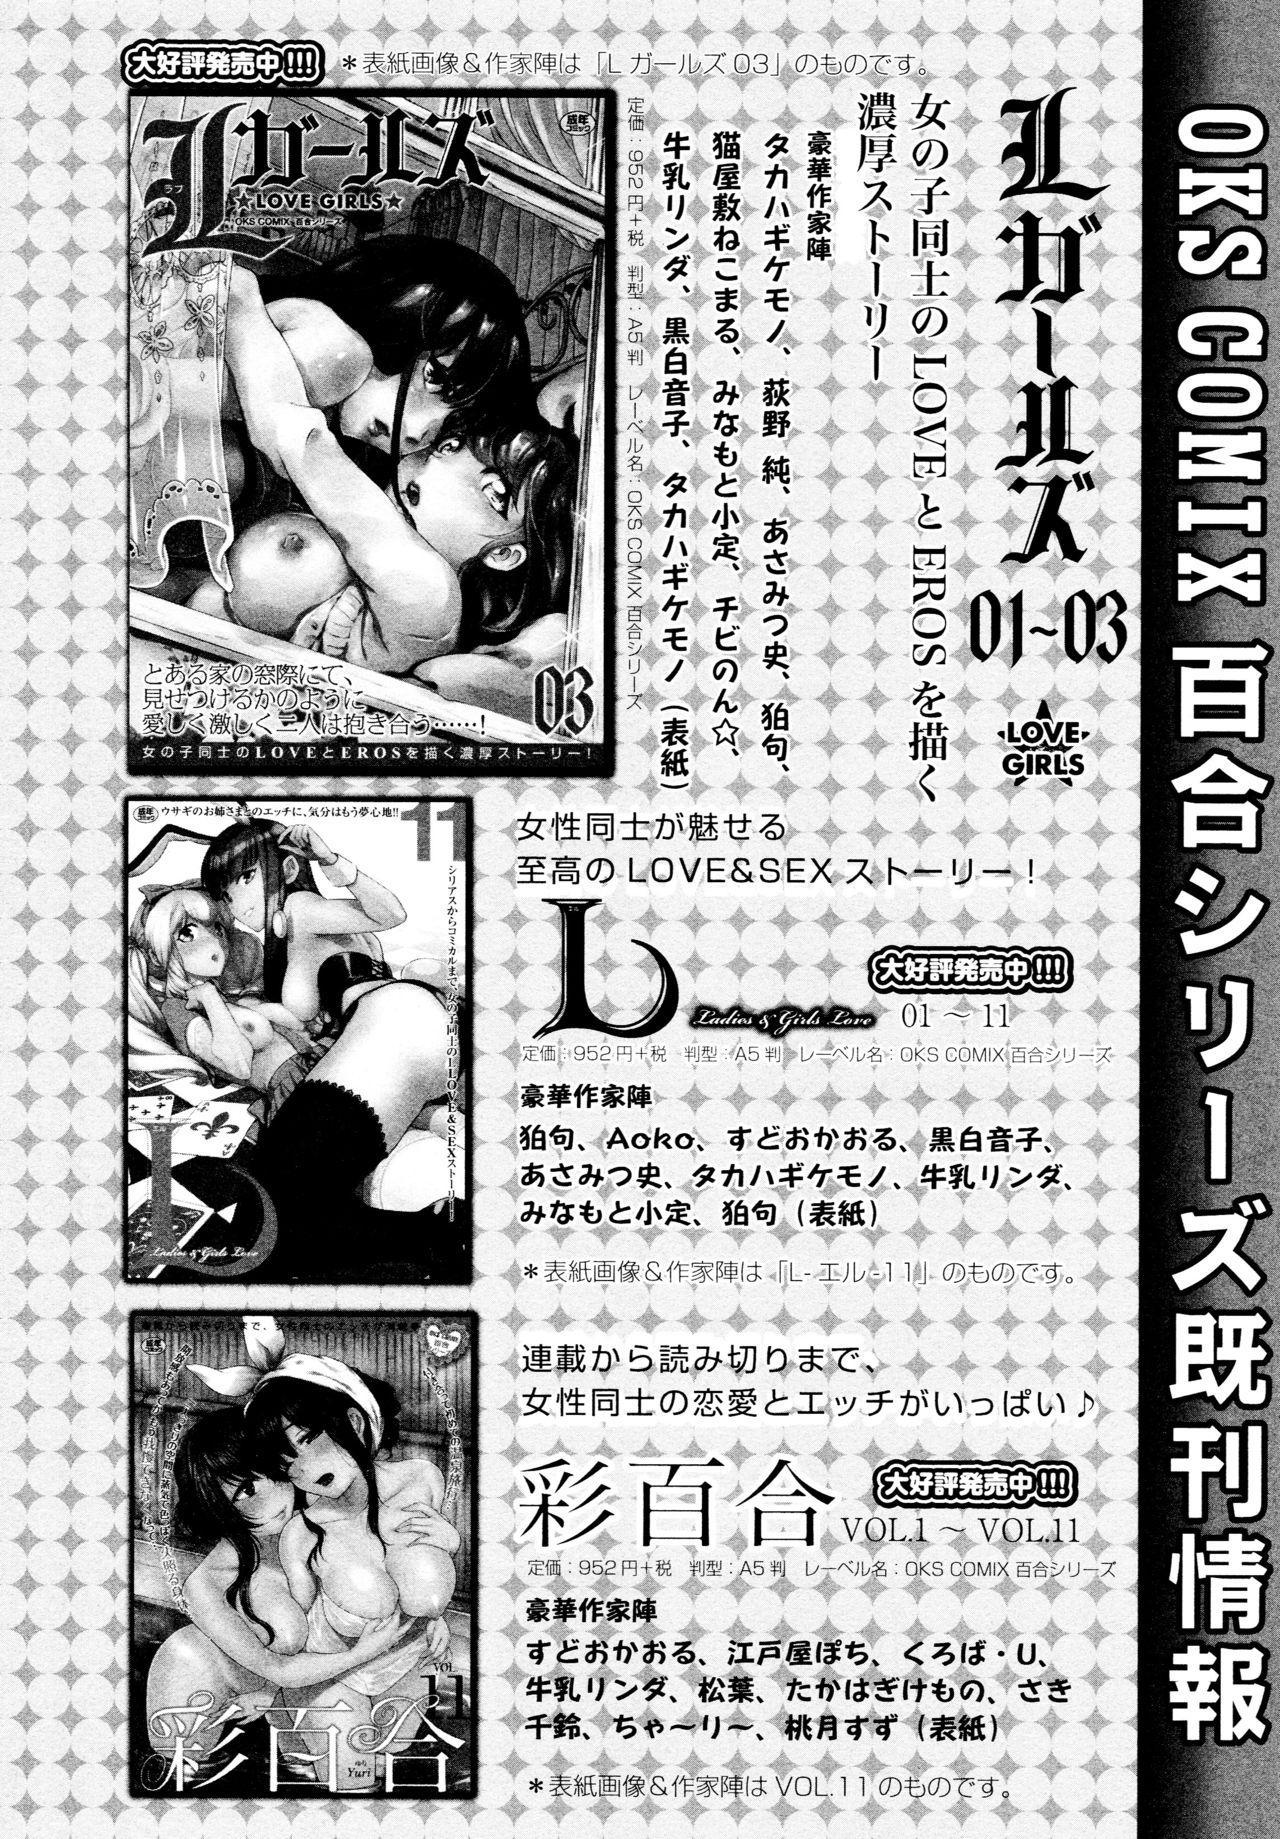 [Anthology] L Girls -Love Girls- 04 171